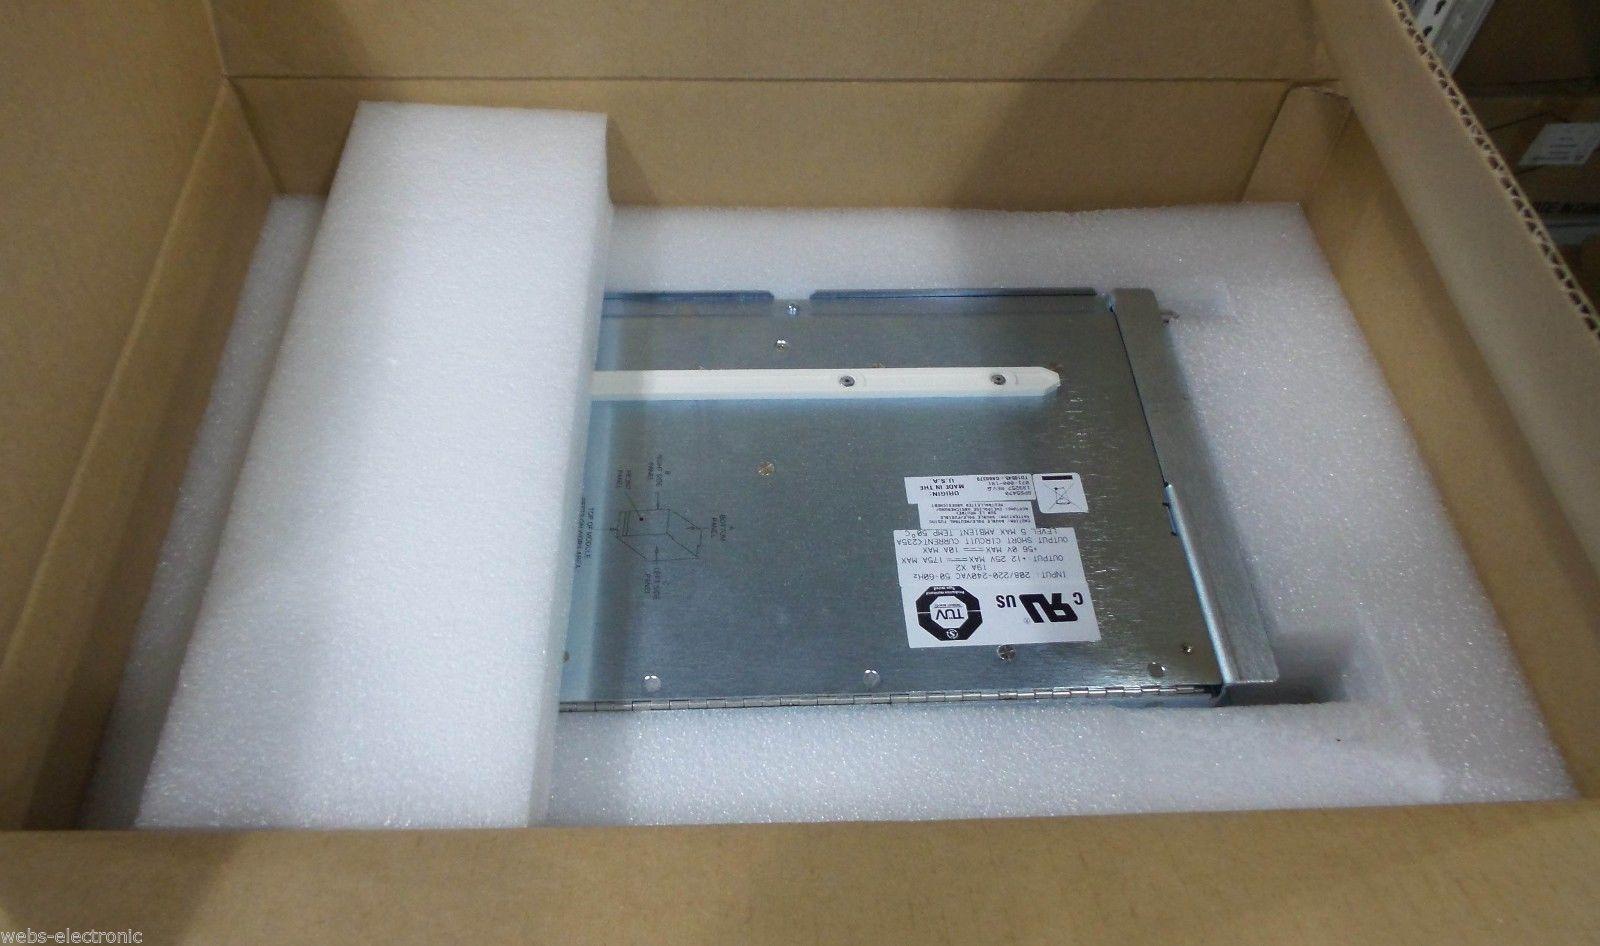 EMC 071-000-191 DMX1000/2000 175W Power Supply td10545-ga80370_2